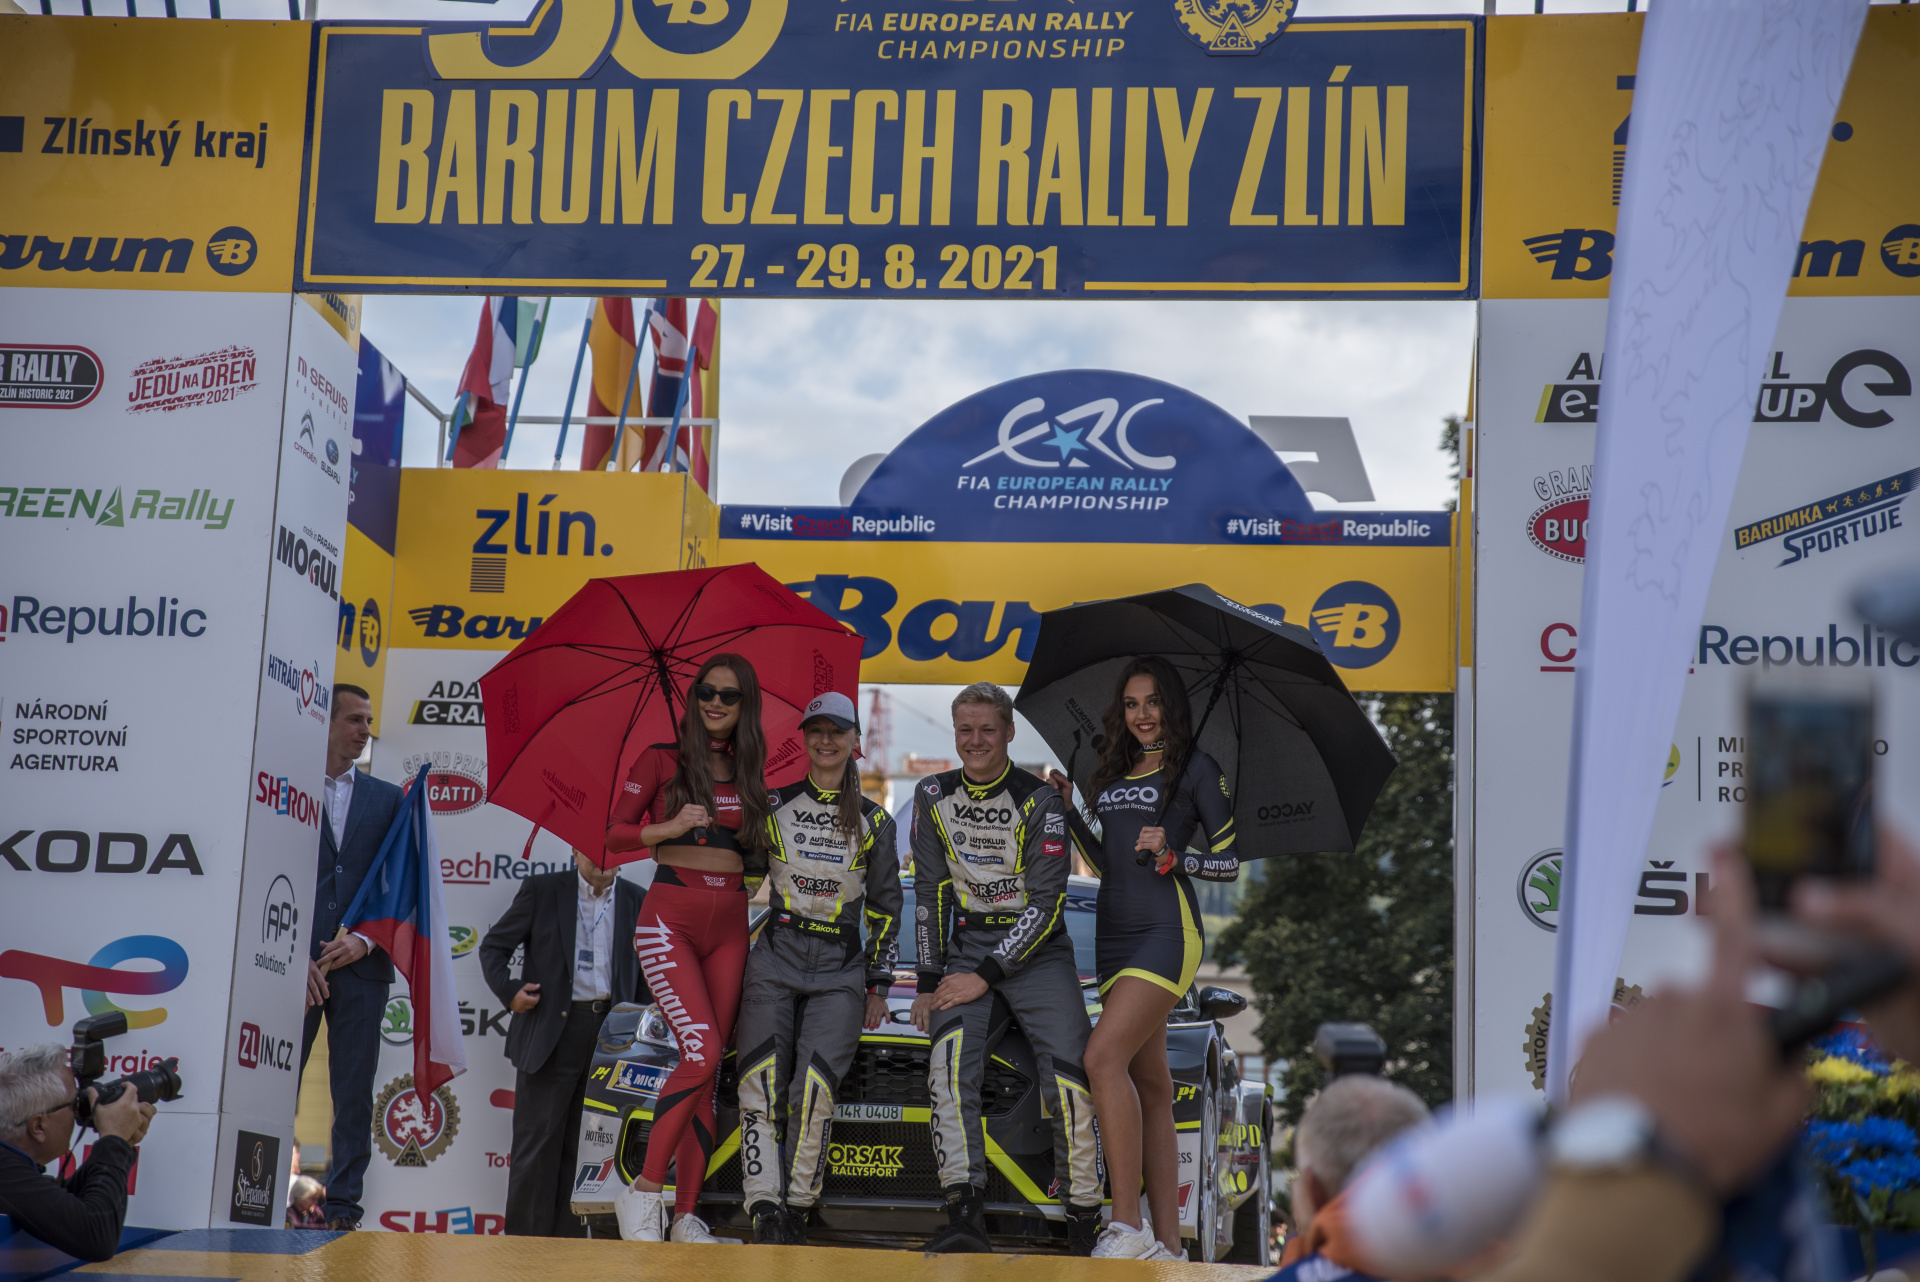 ERC: 50º Barum Czech Rally Zlin [27-29 Agosto] E91PwYLWUAUeG-9?format=jpg&name=large